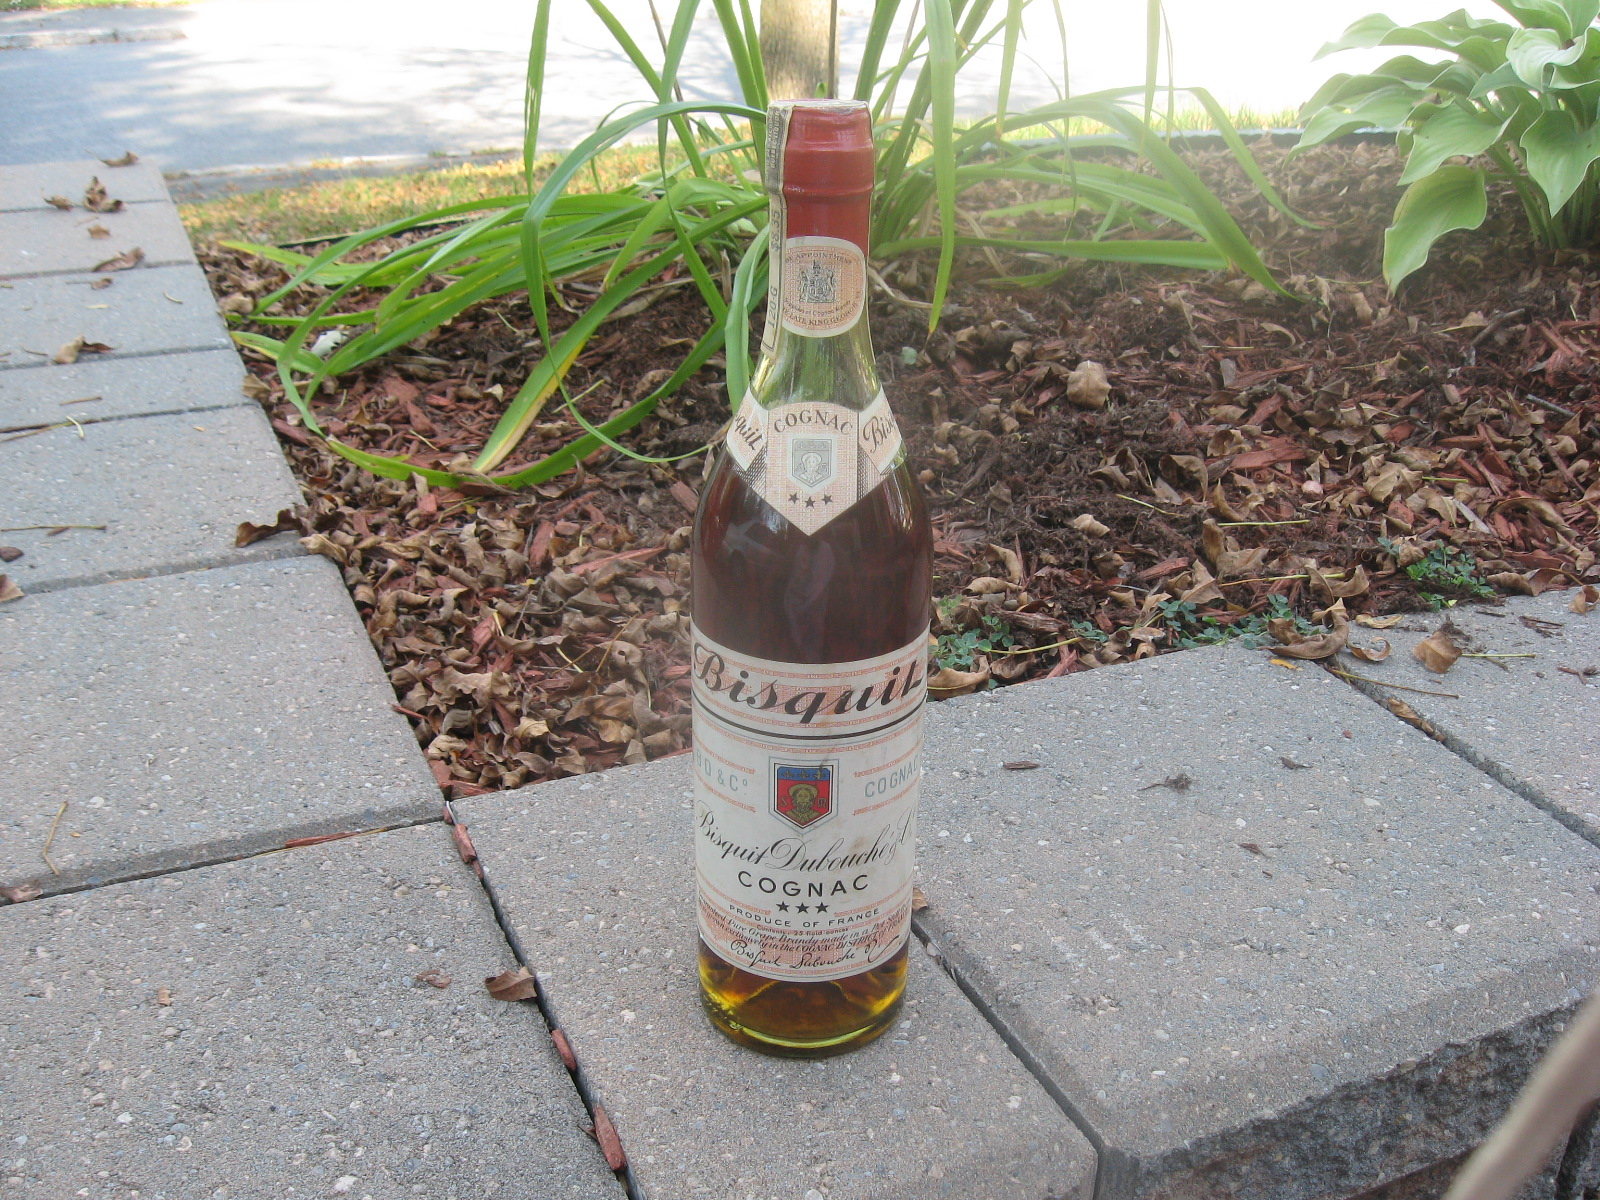 Older Cognac Bottle of Bisquit Dubouché Three Star VS